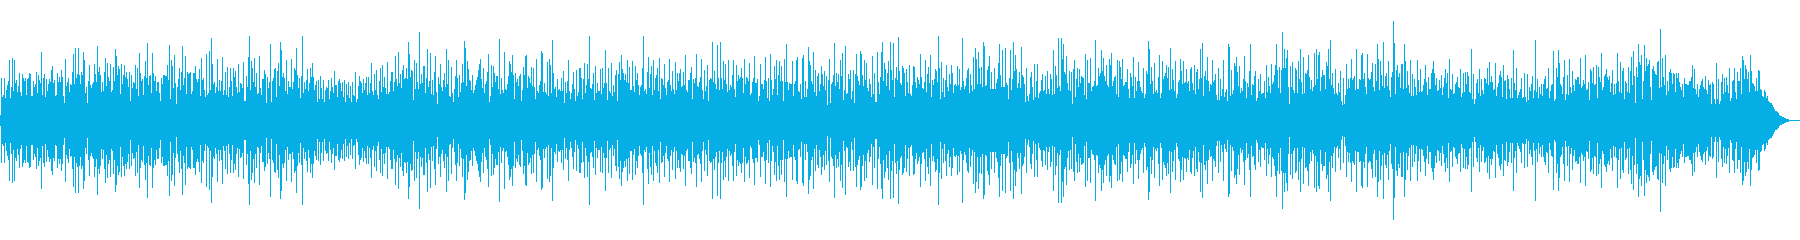 BGM|穏やかで温かい雰囲気のあるジャズの再生済みの波形